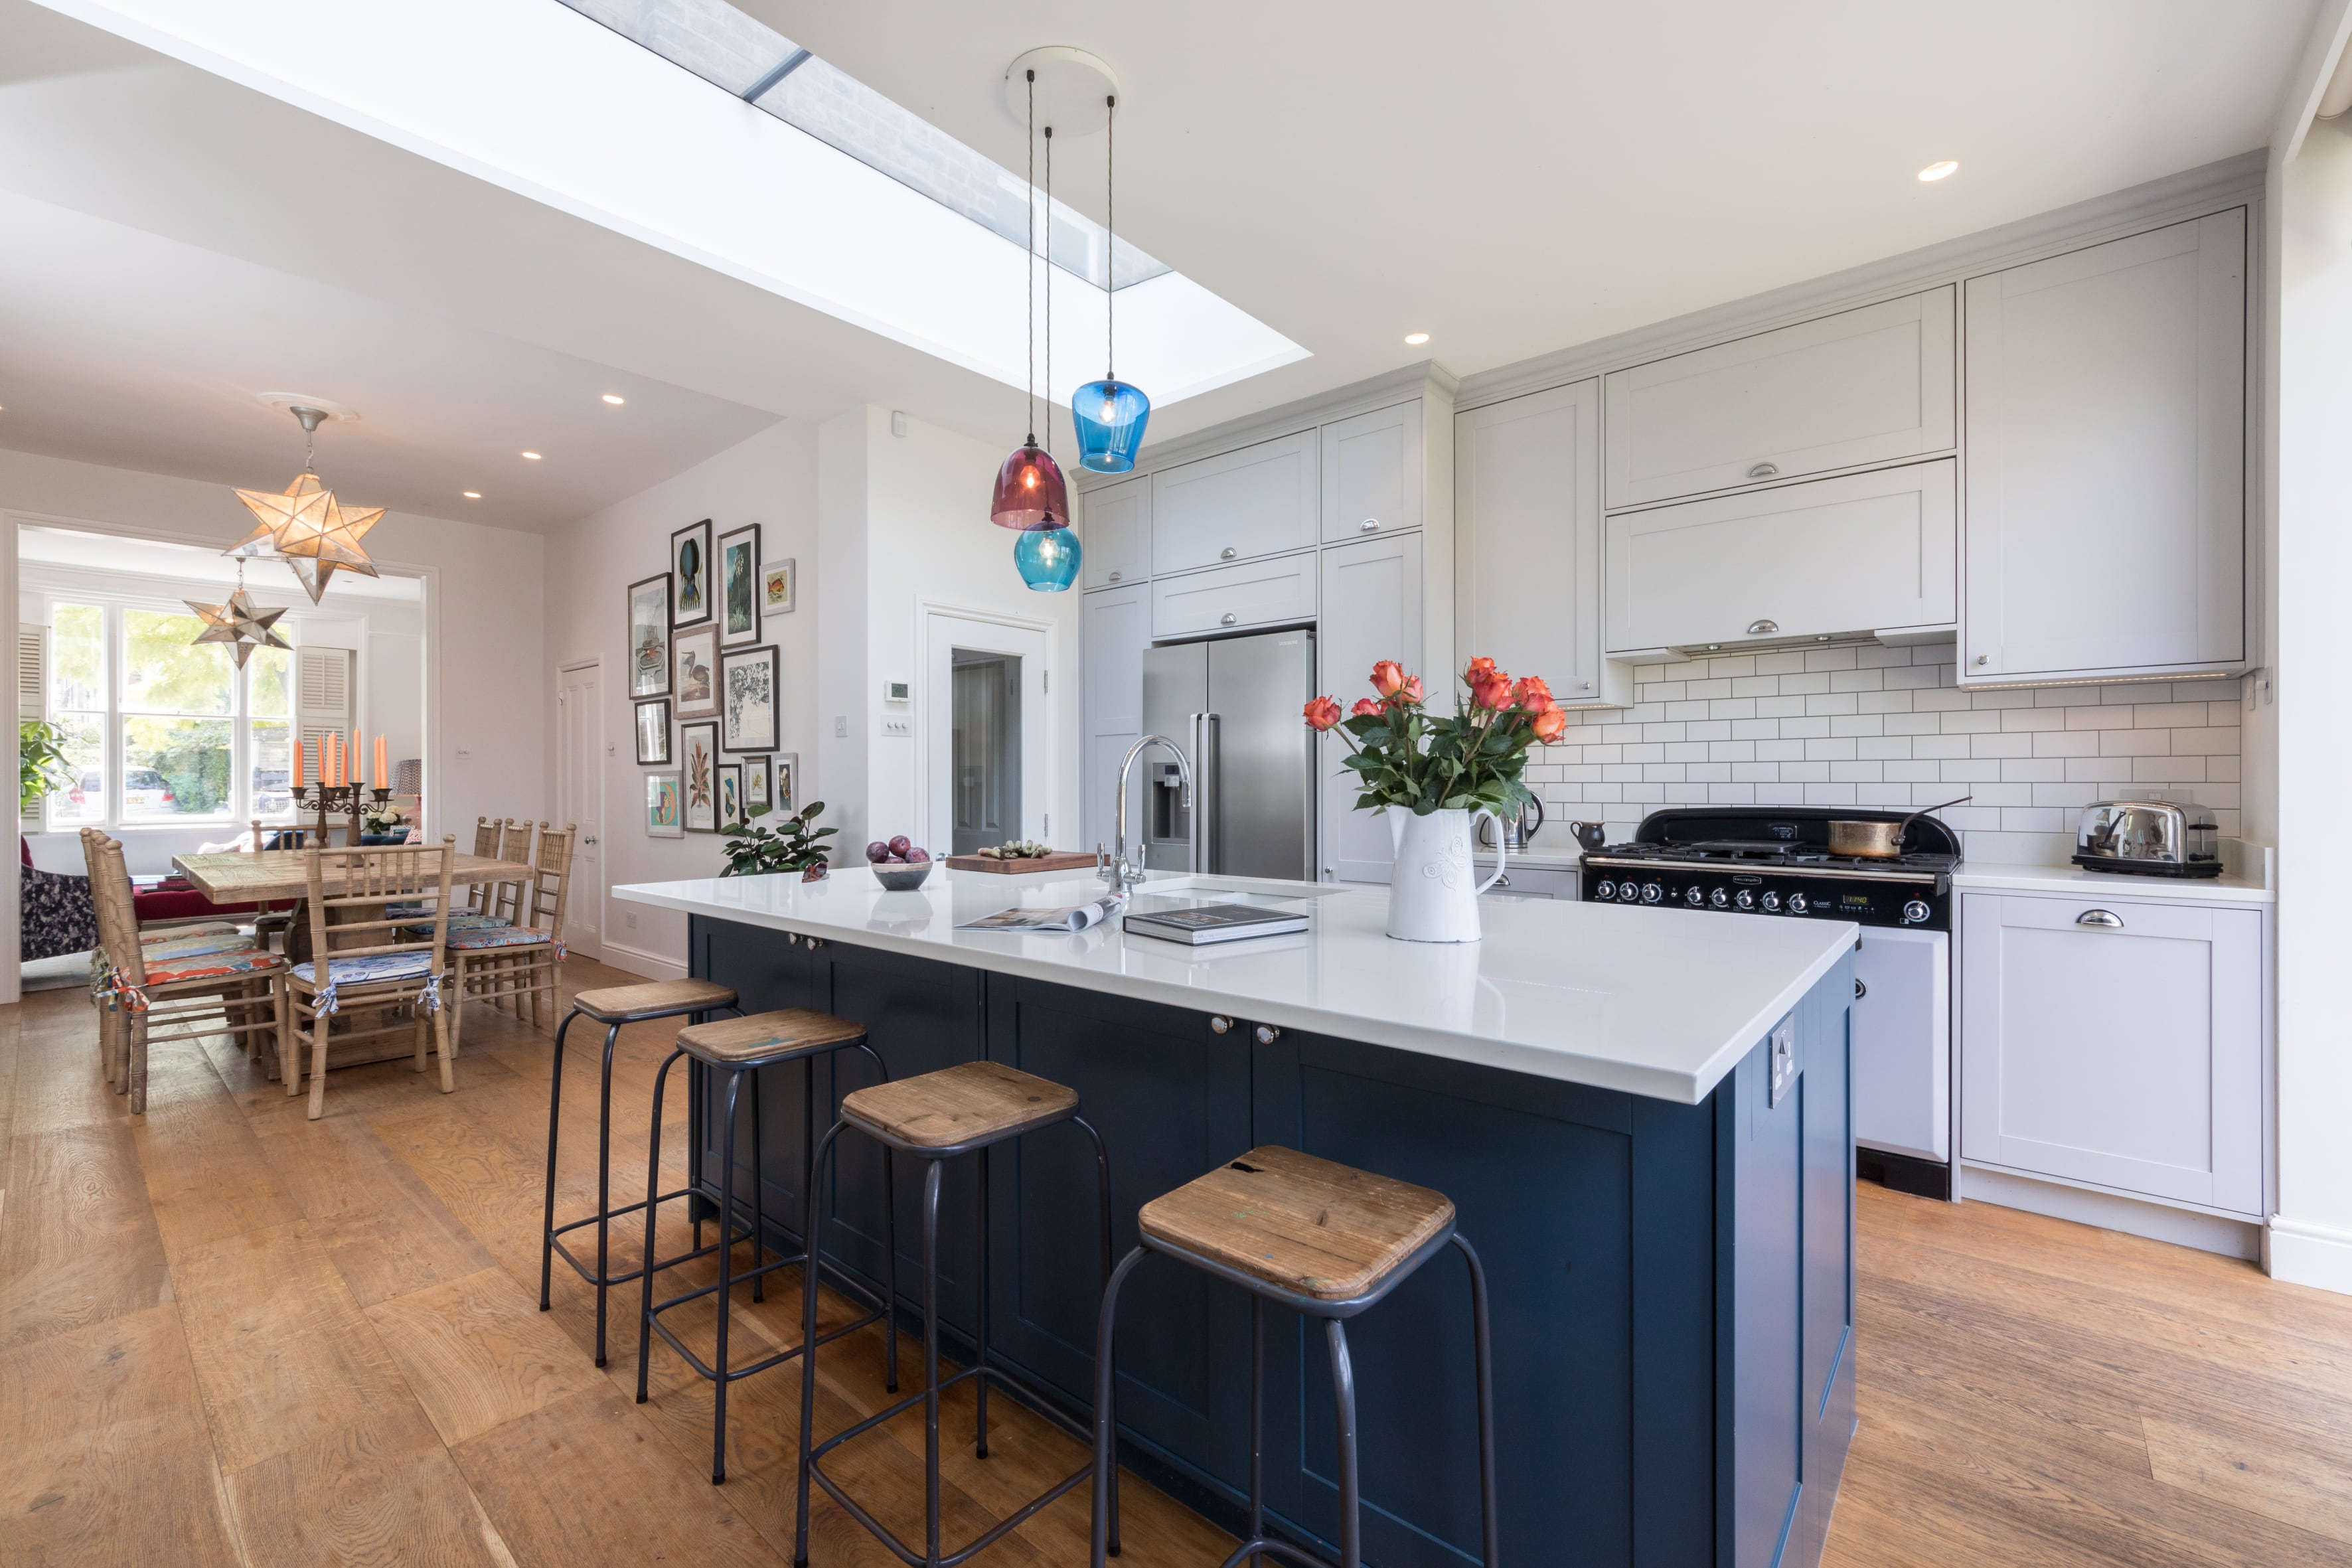 Richmond kitchen design with blue island and multi-coloured pendants